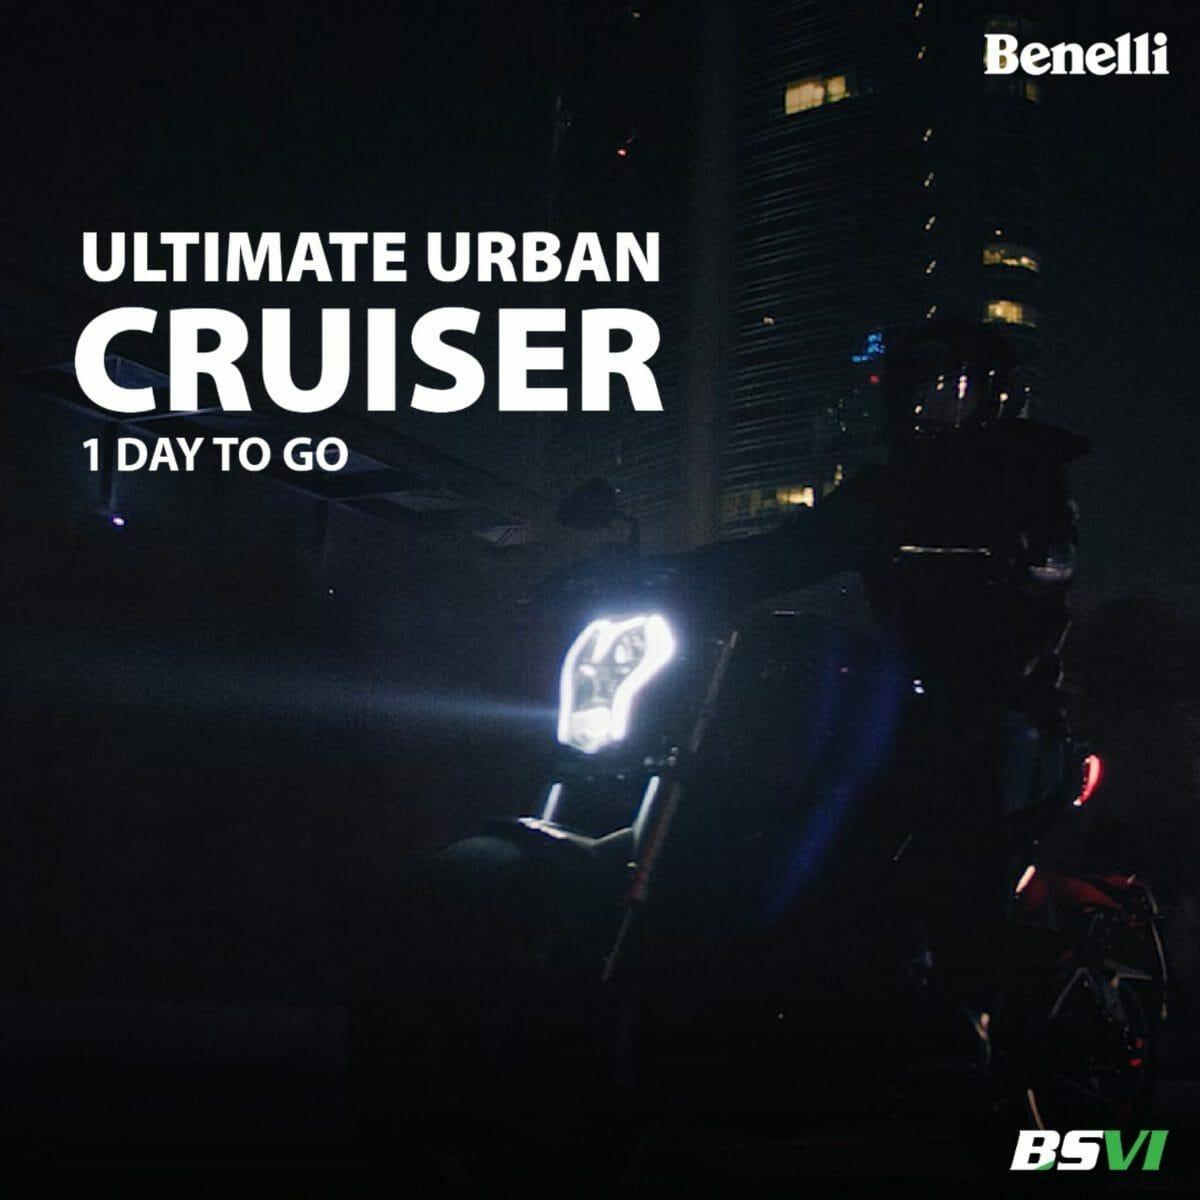 Benelli 502C Cruiser teased